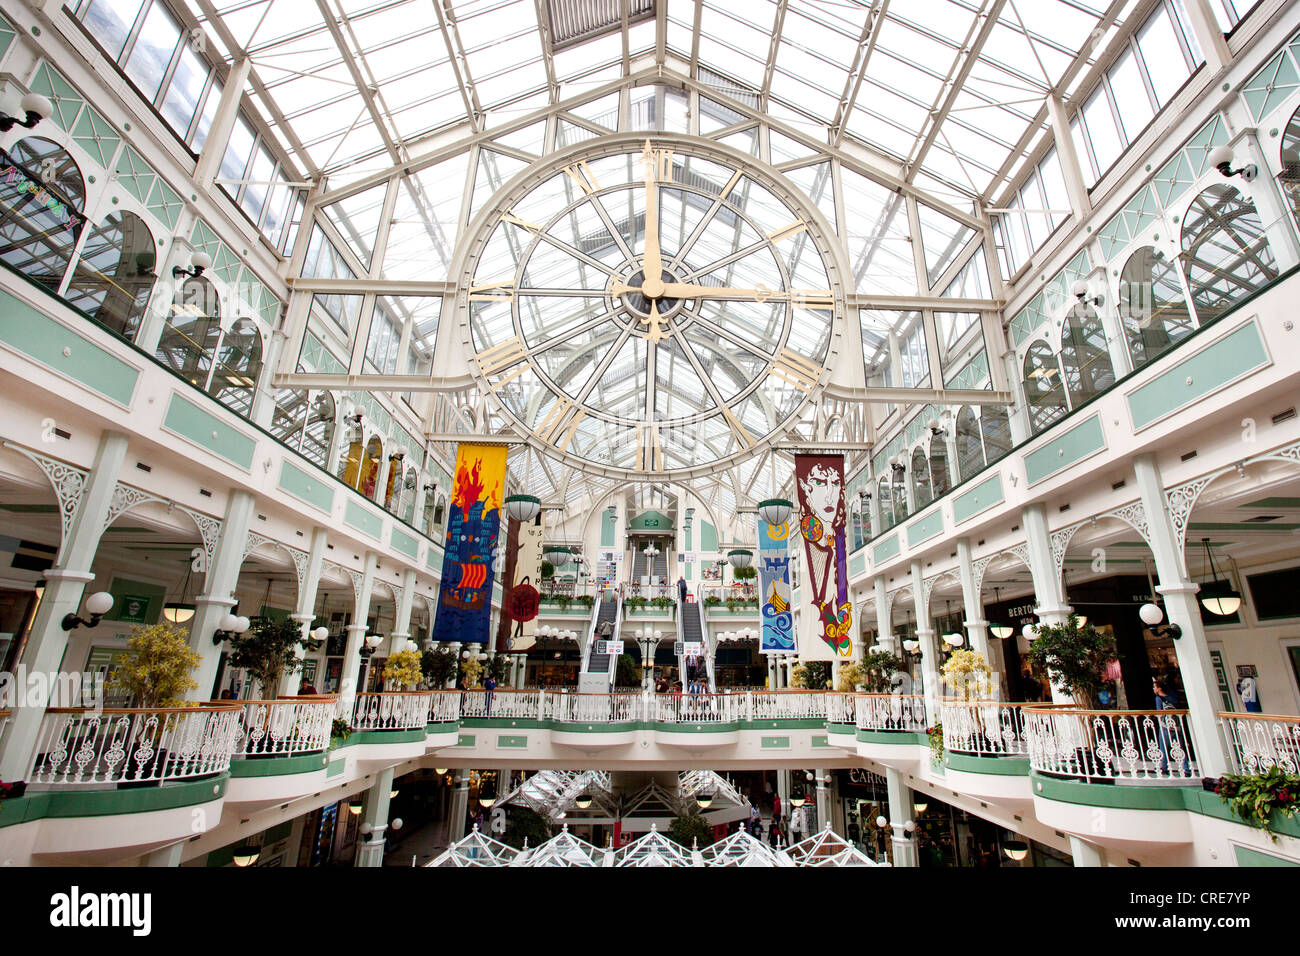 Stephens Green Shopping Centre, Dublin, Ireland, Europe - Stock Image